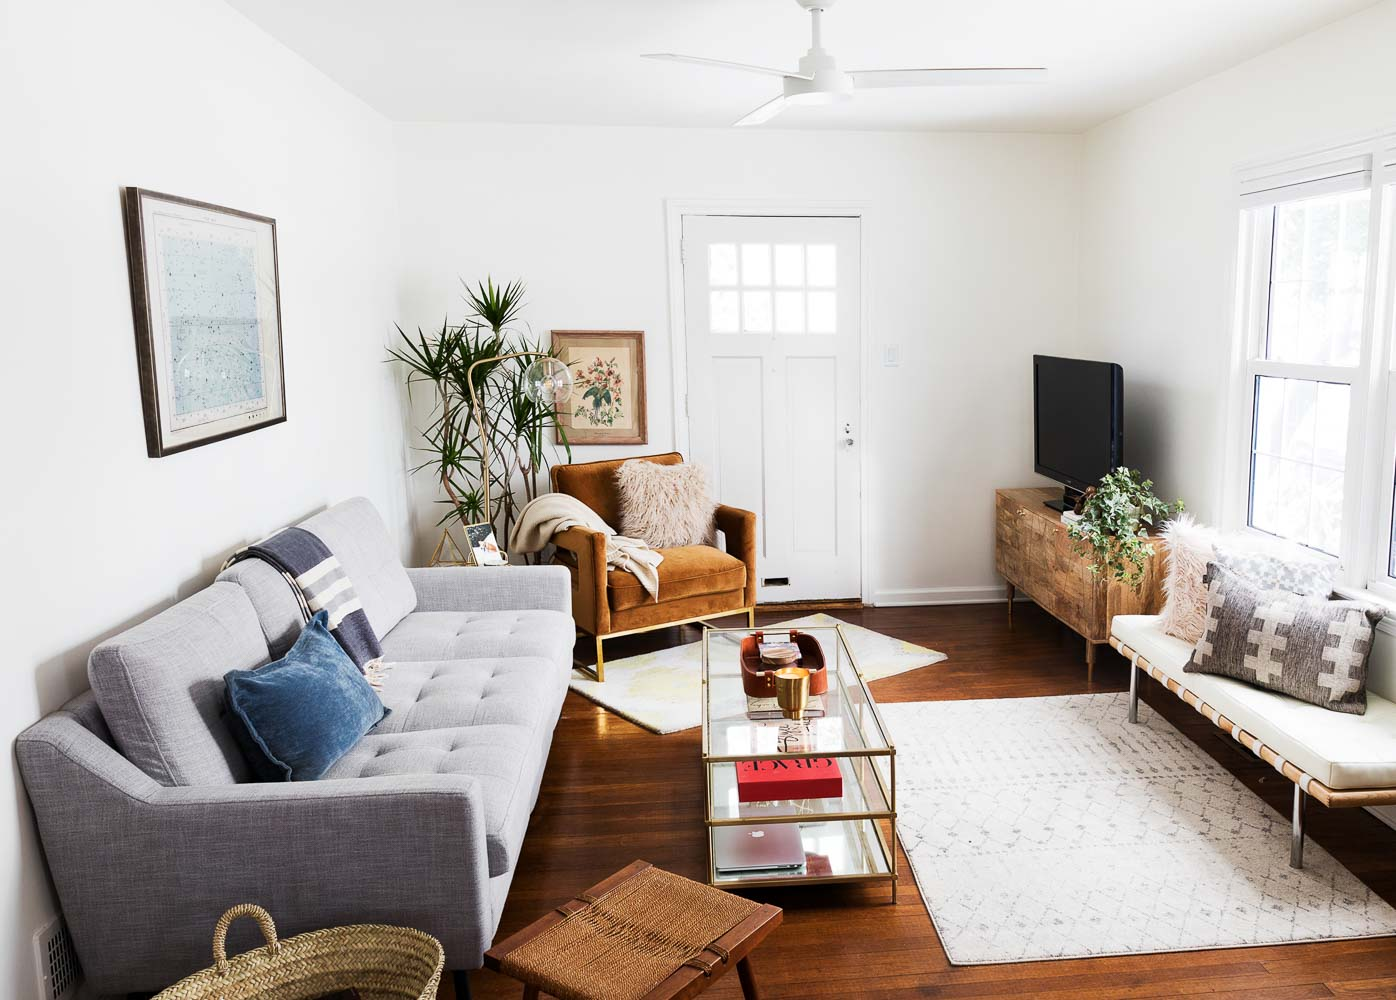 bright-bungalow-home-studio-new-jersey-natural-light-photo-studio-rental-8.jpg